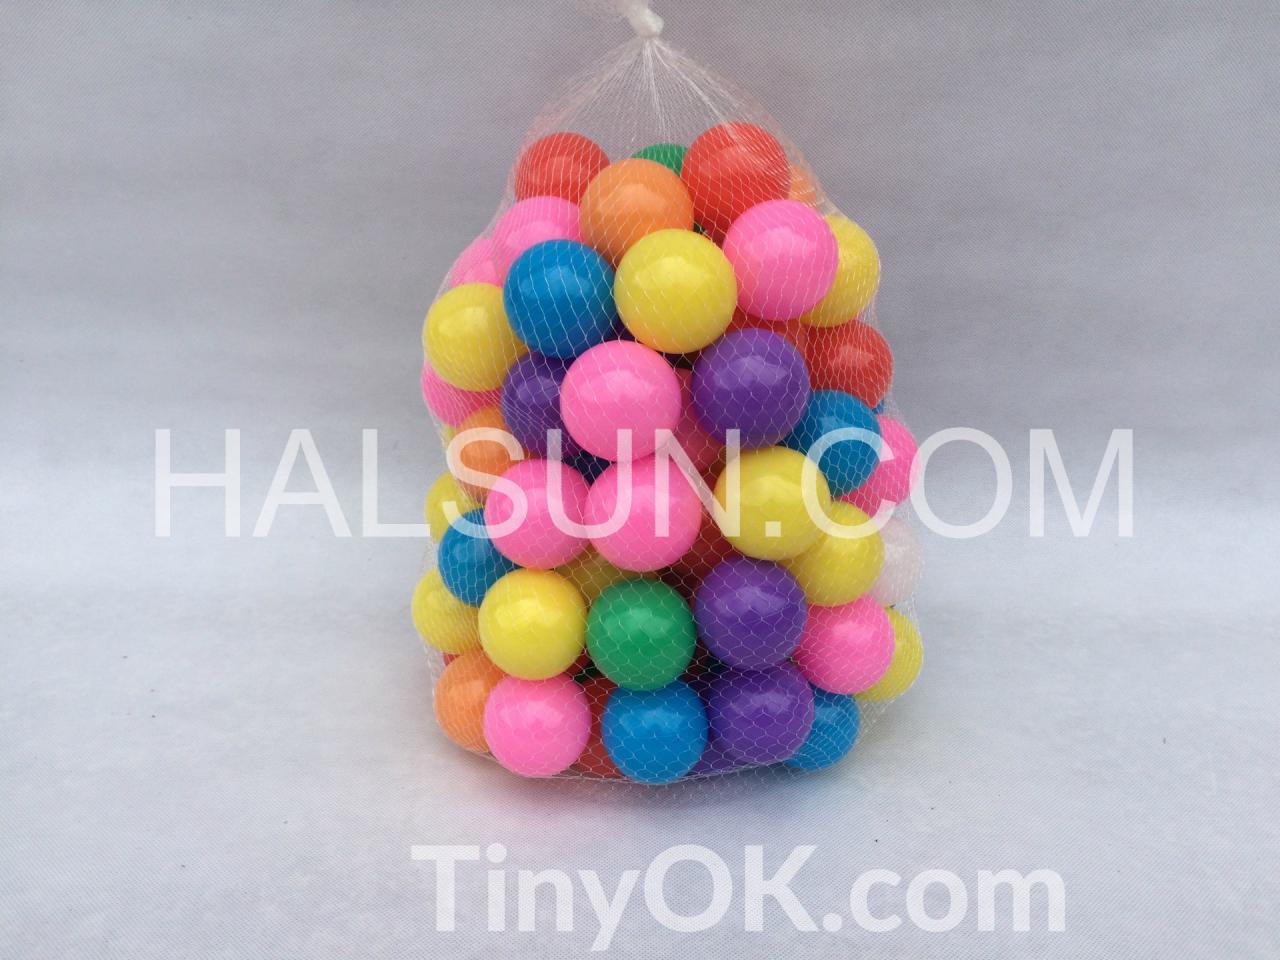 plastic-ocean-balls-15.jpg